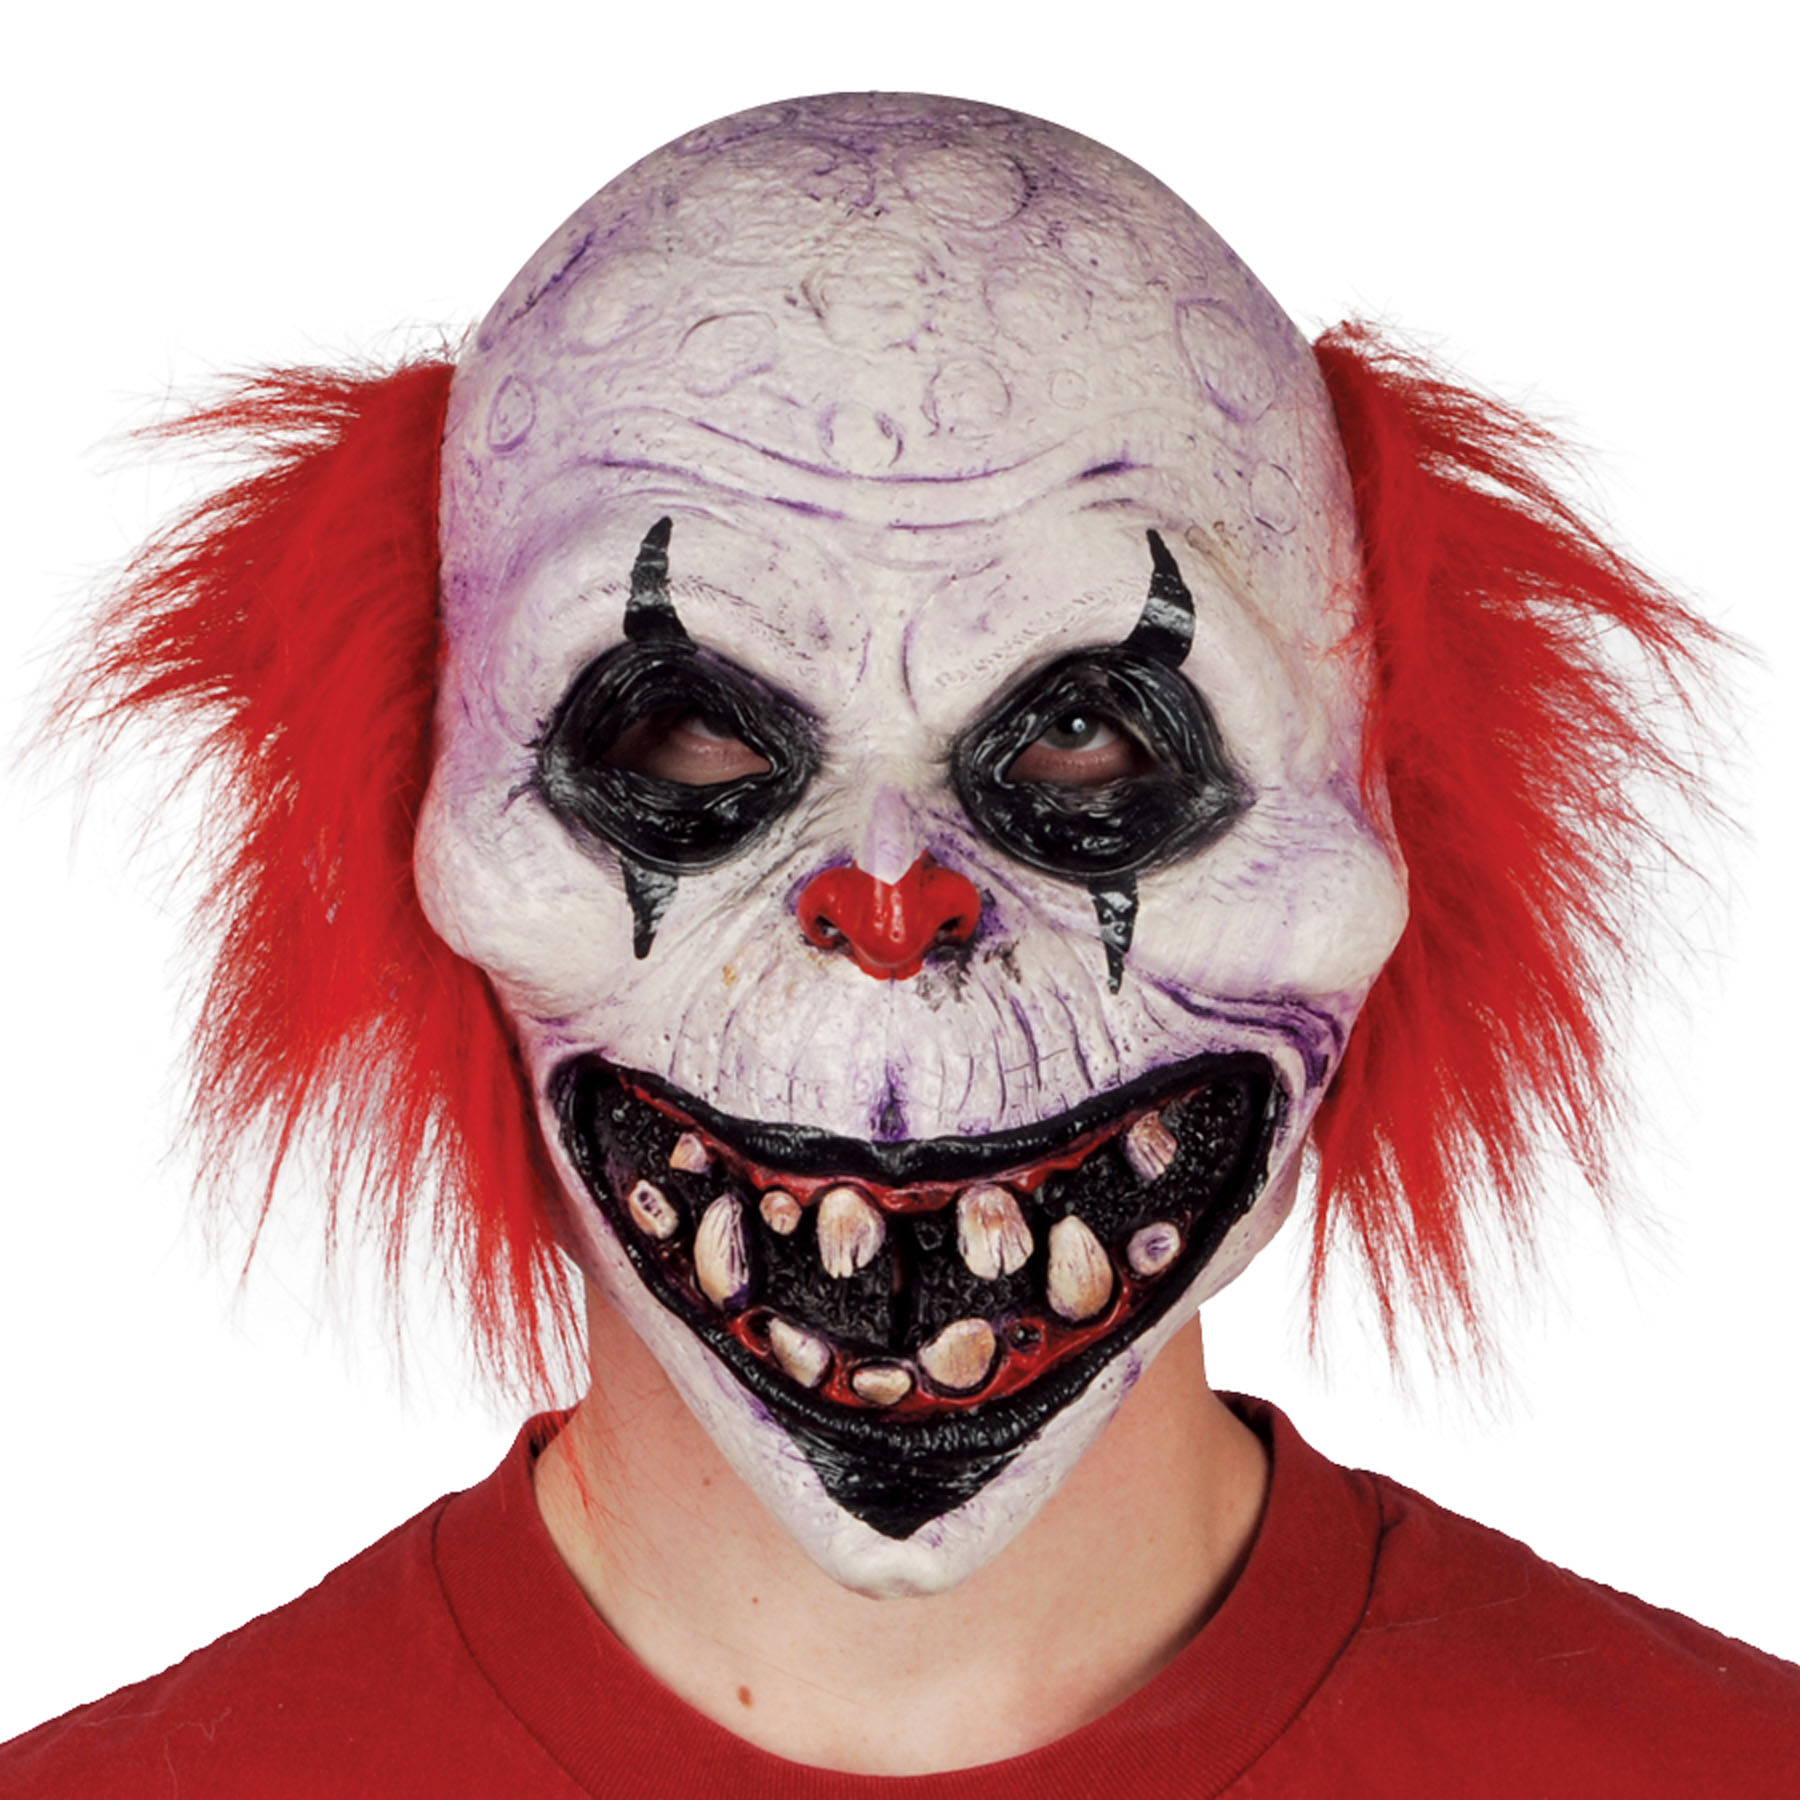 Loftus Evil Clown Mask w Red Balding Hair - Adult One Size